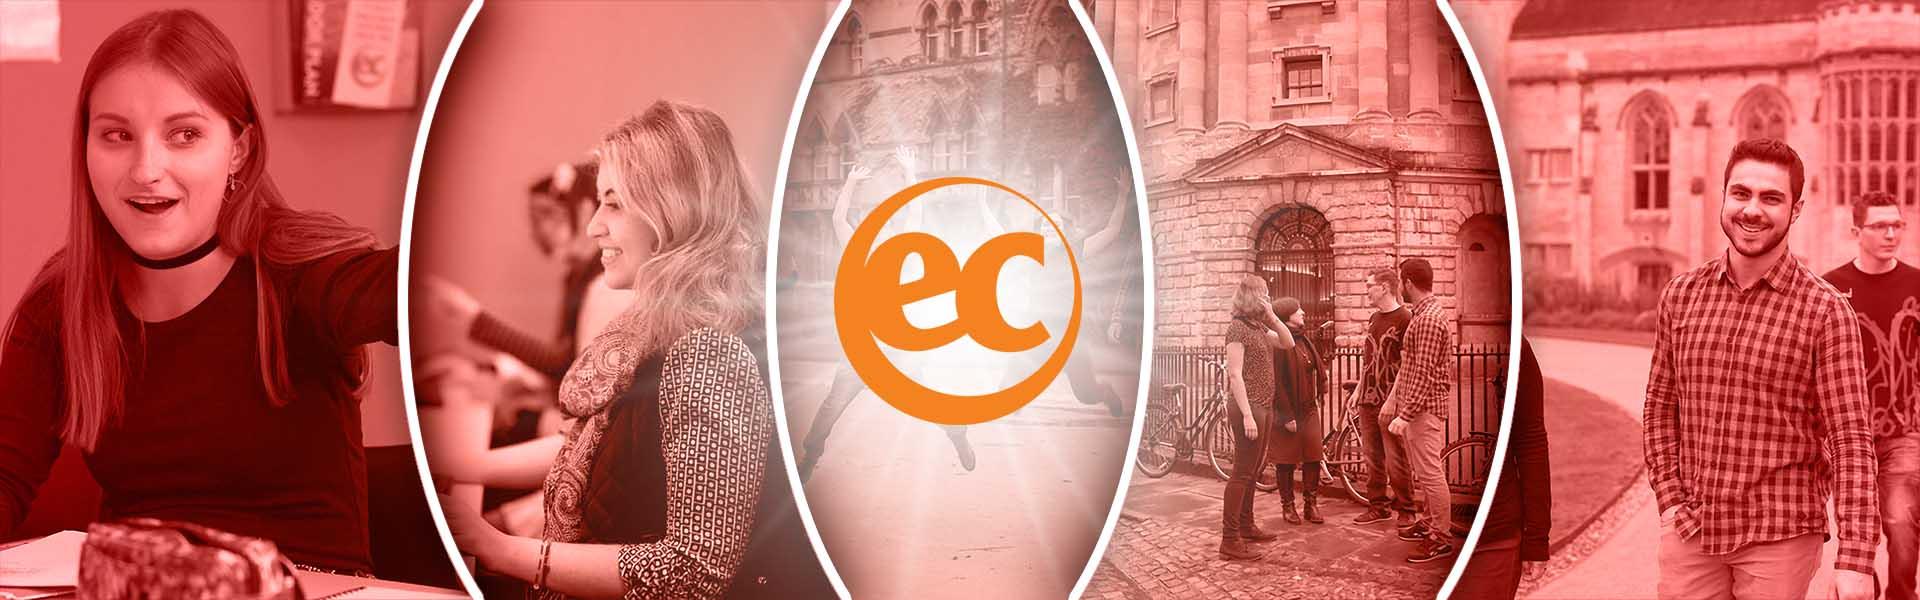 EC English Oxford Dil Okulu